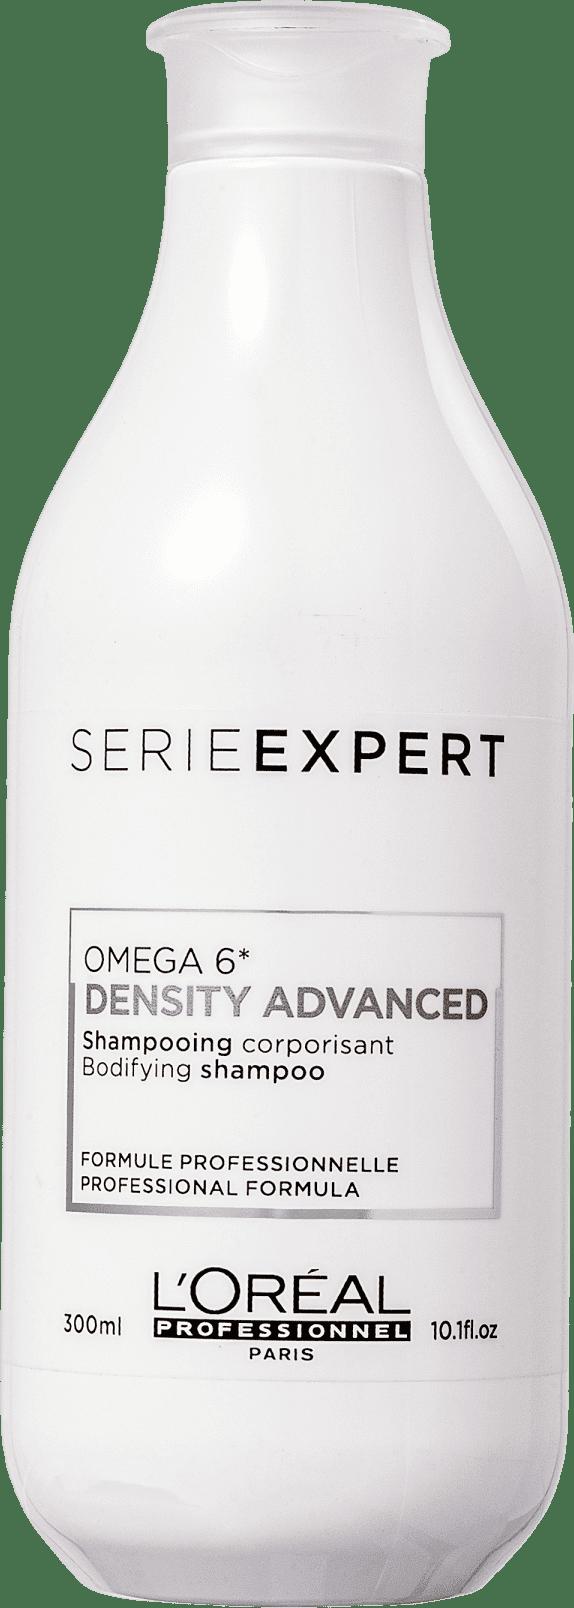 Shampoo Density Advanced 300ml Loreal